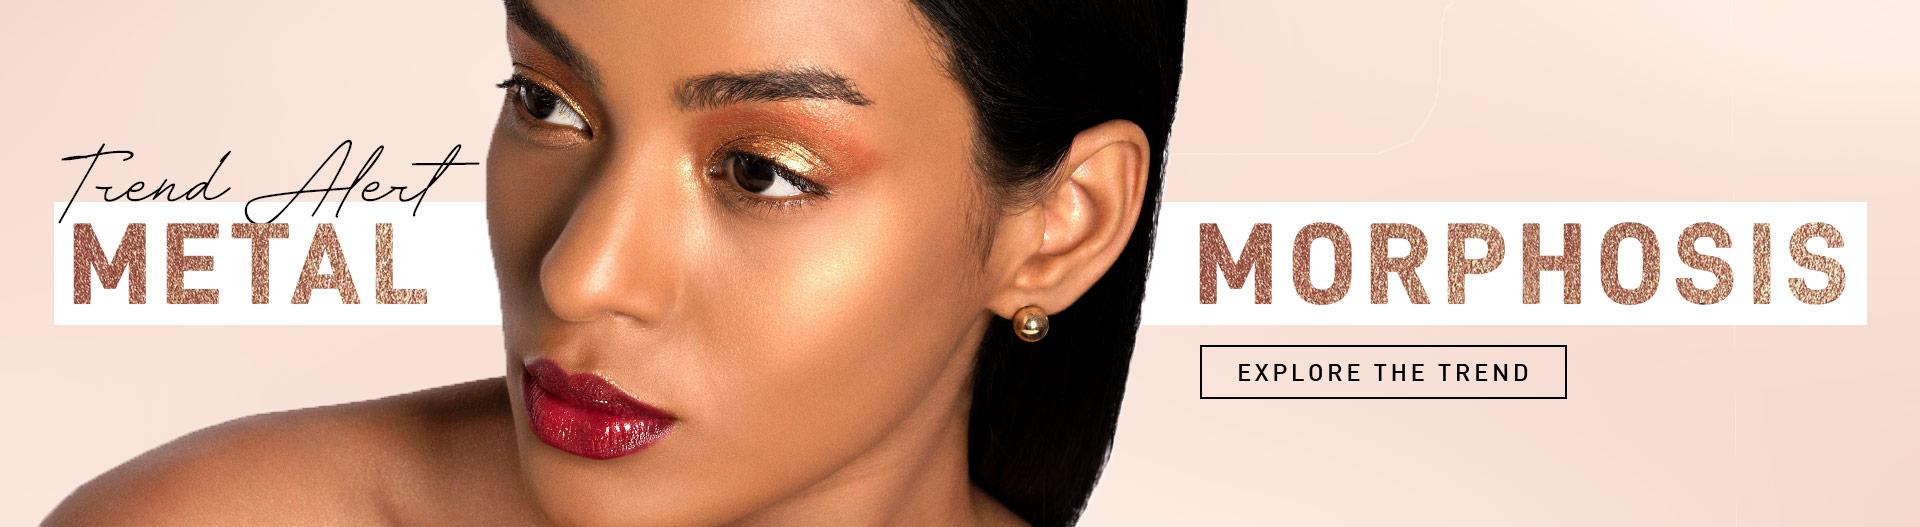 Metal-Morphosis Makeup Collection